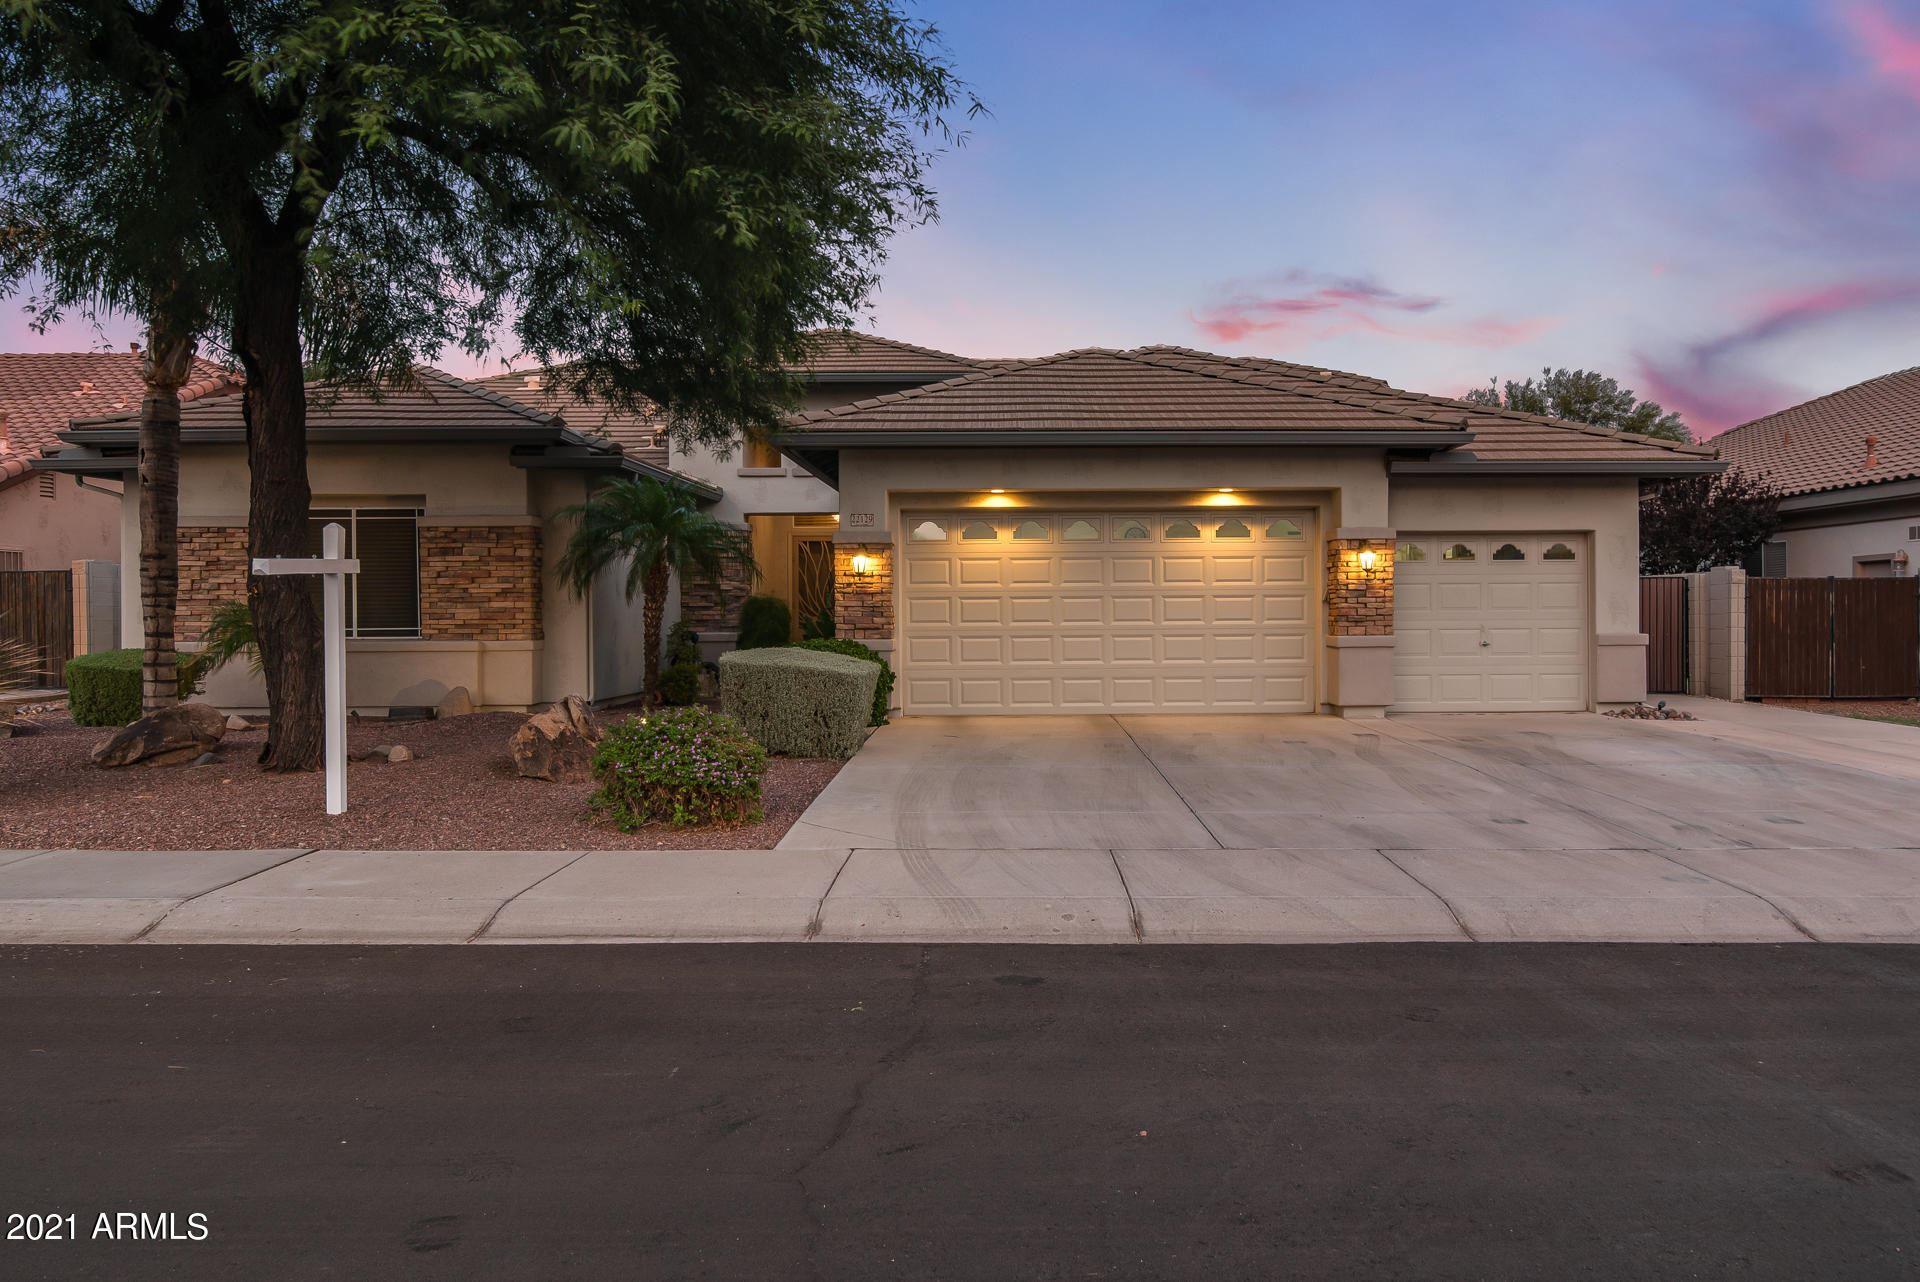 22129 N 80Th Dr Drive, Peoria, AZ 85383 - MLS#: 6262880